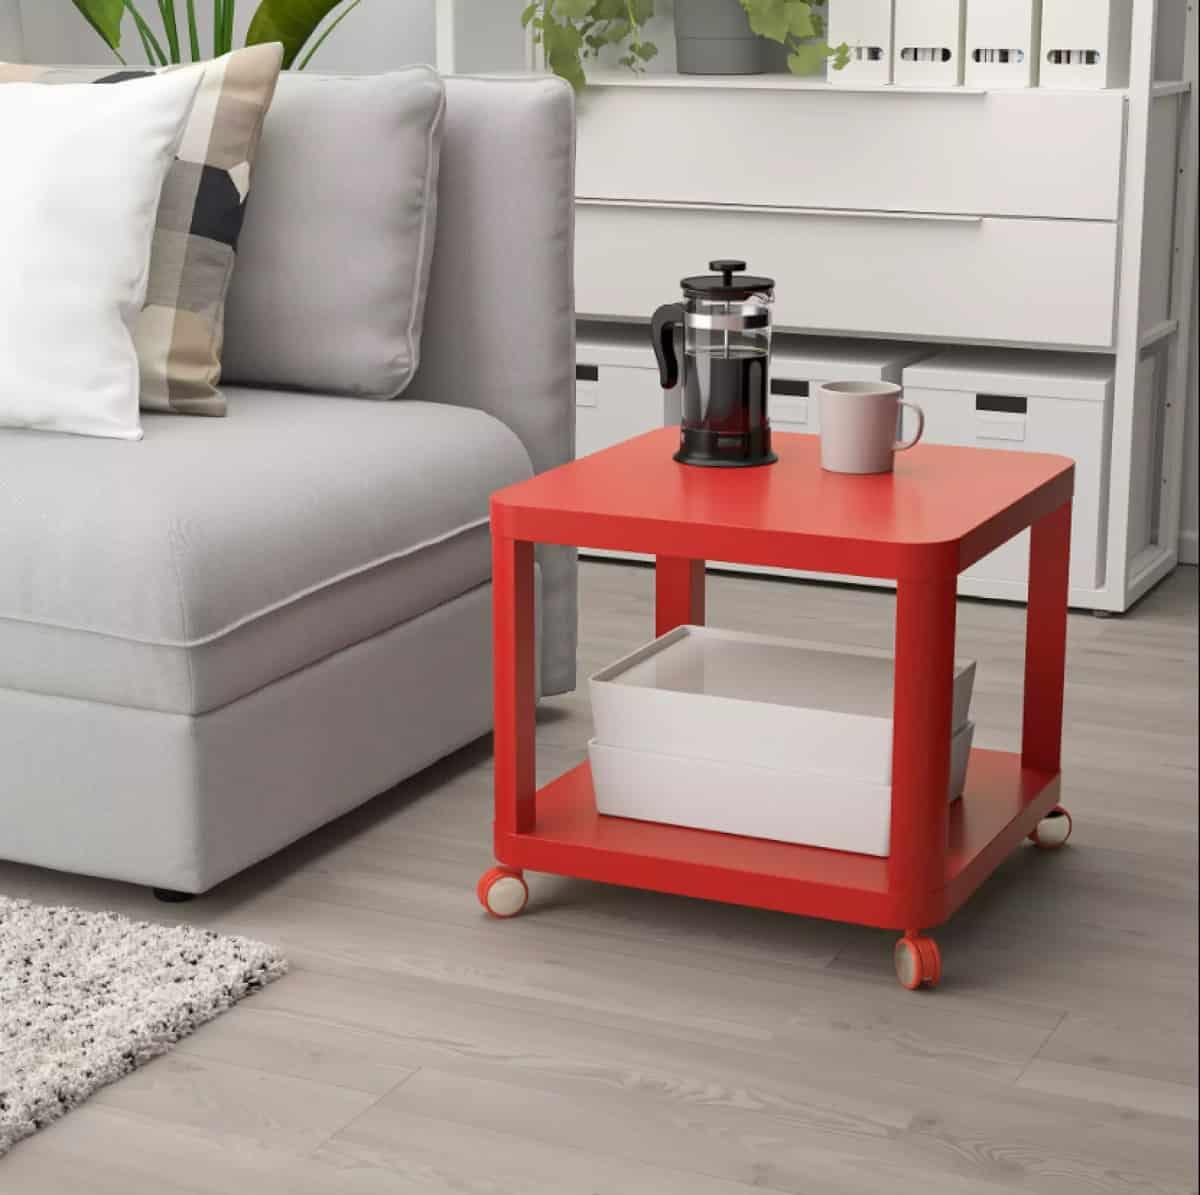 Descubre las mesas auxiliares de Ikea